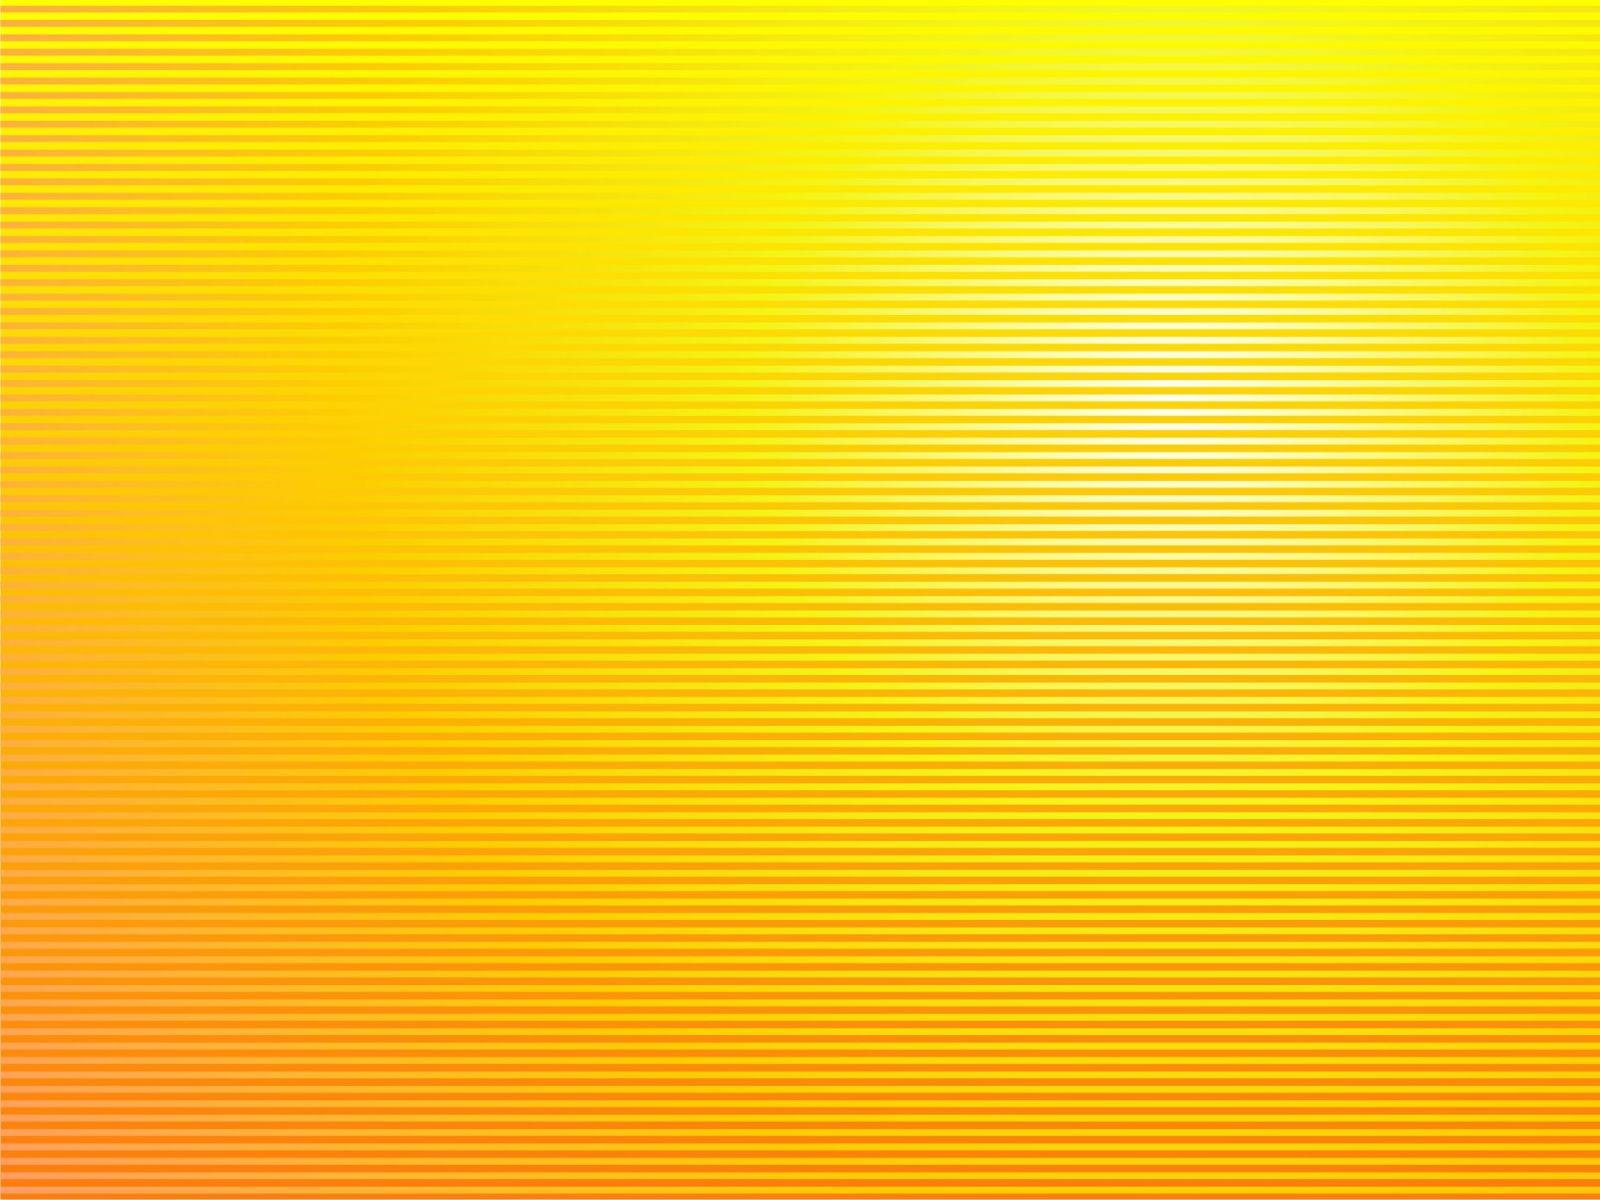 ... Yellow Background ...